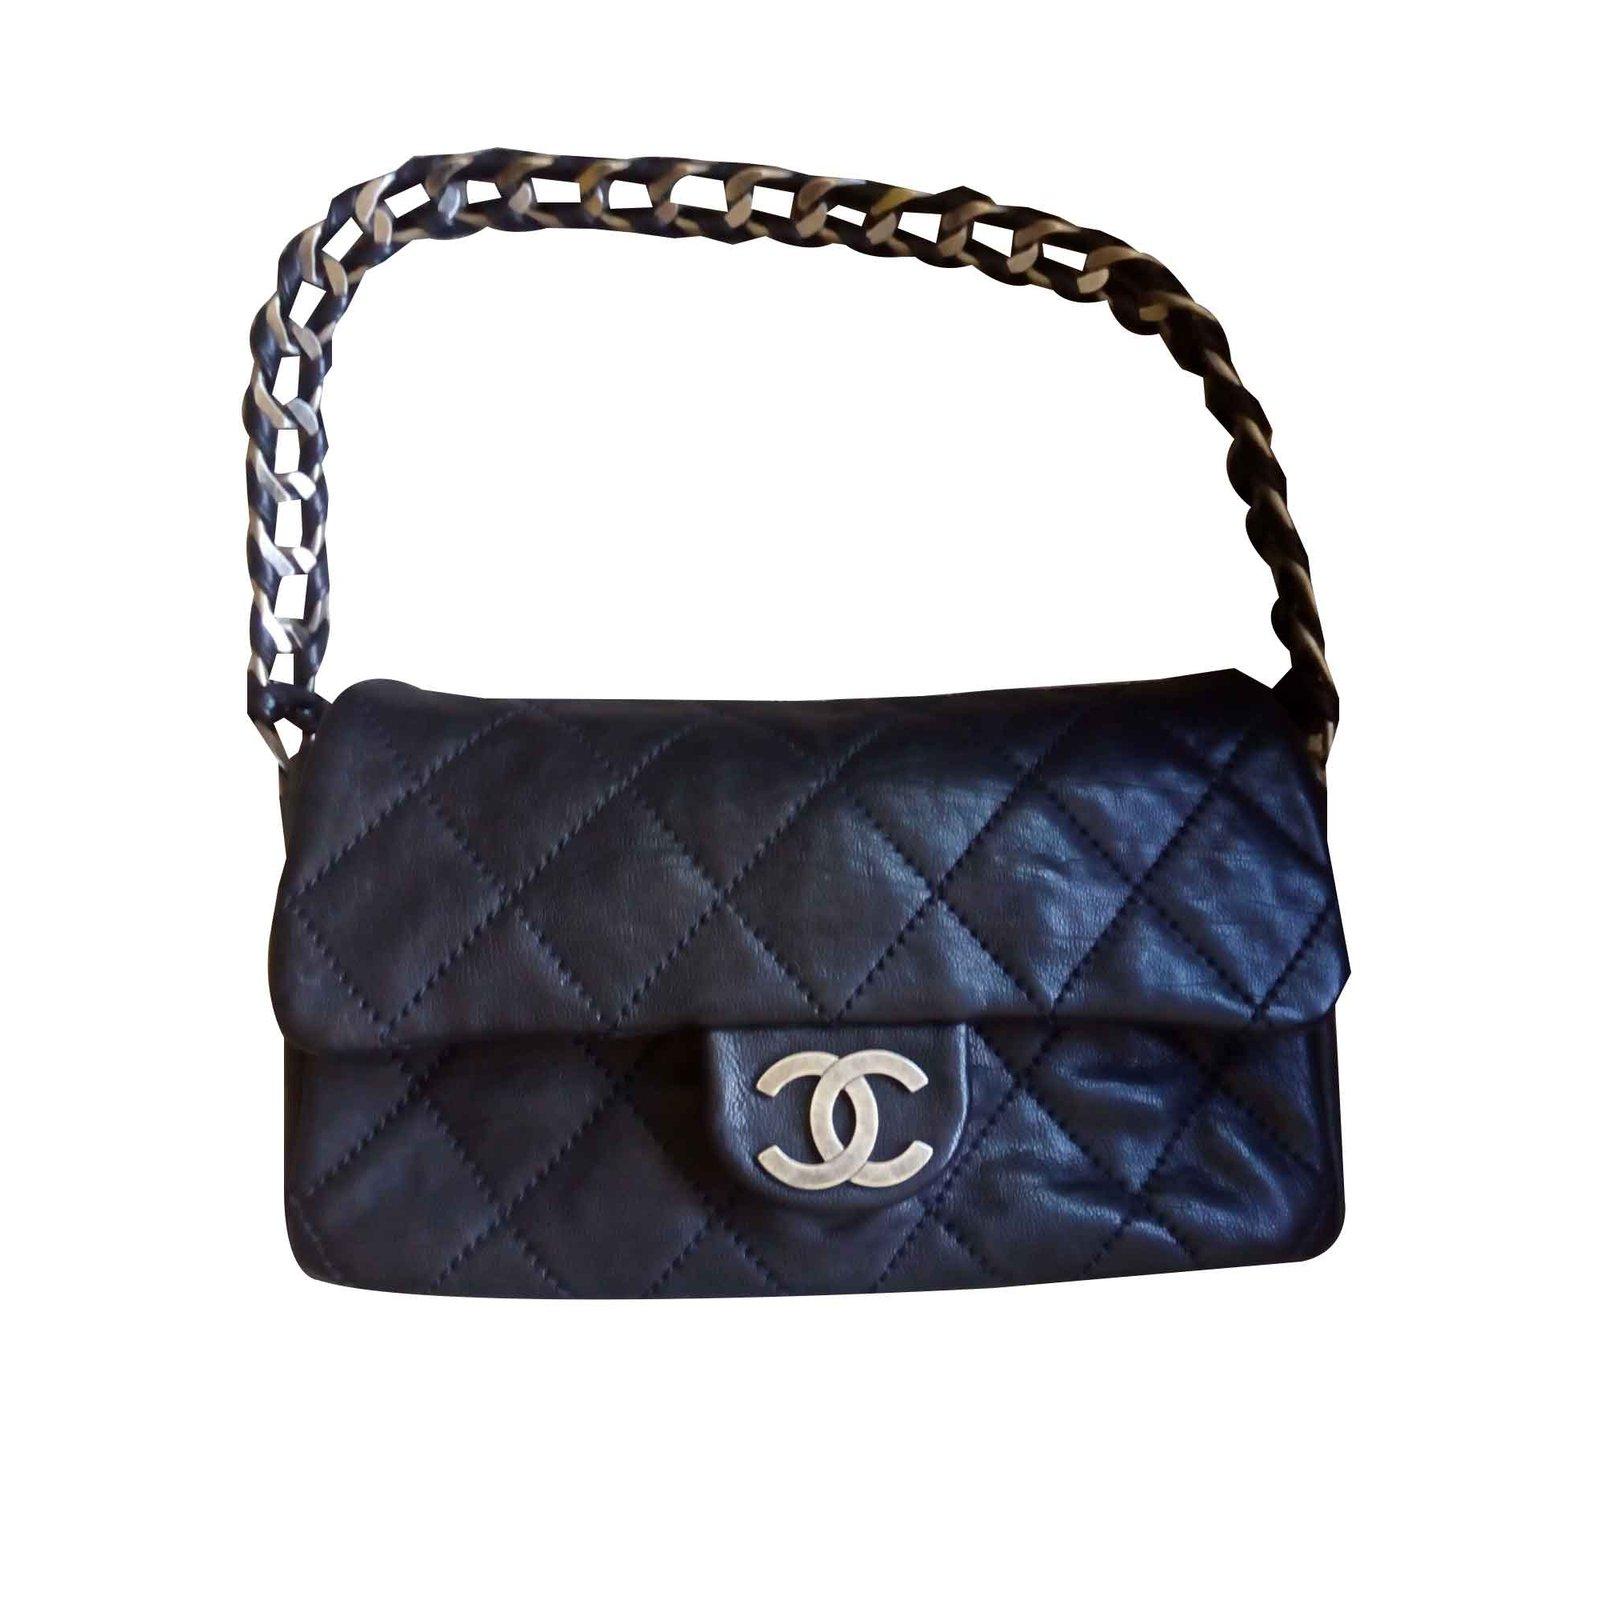 269d16da56dbcb Chanel 2.55 Handbags Leather Black ref.109821 - Joli Closet